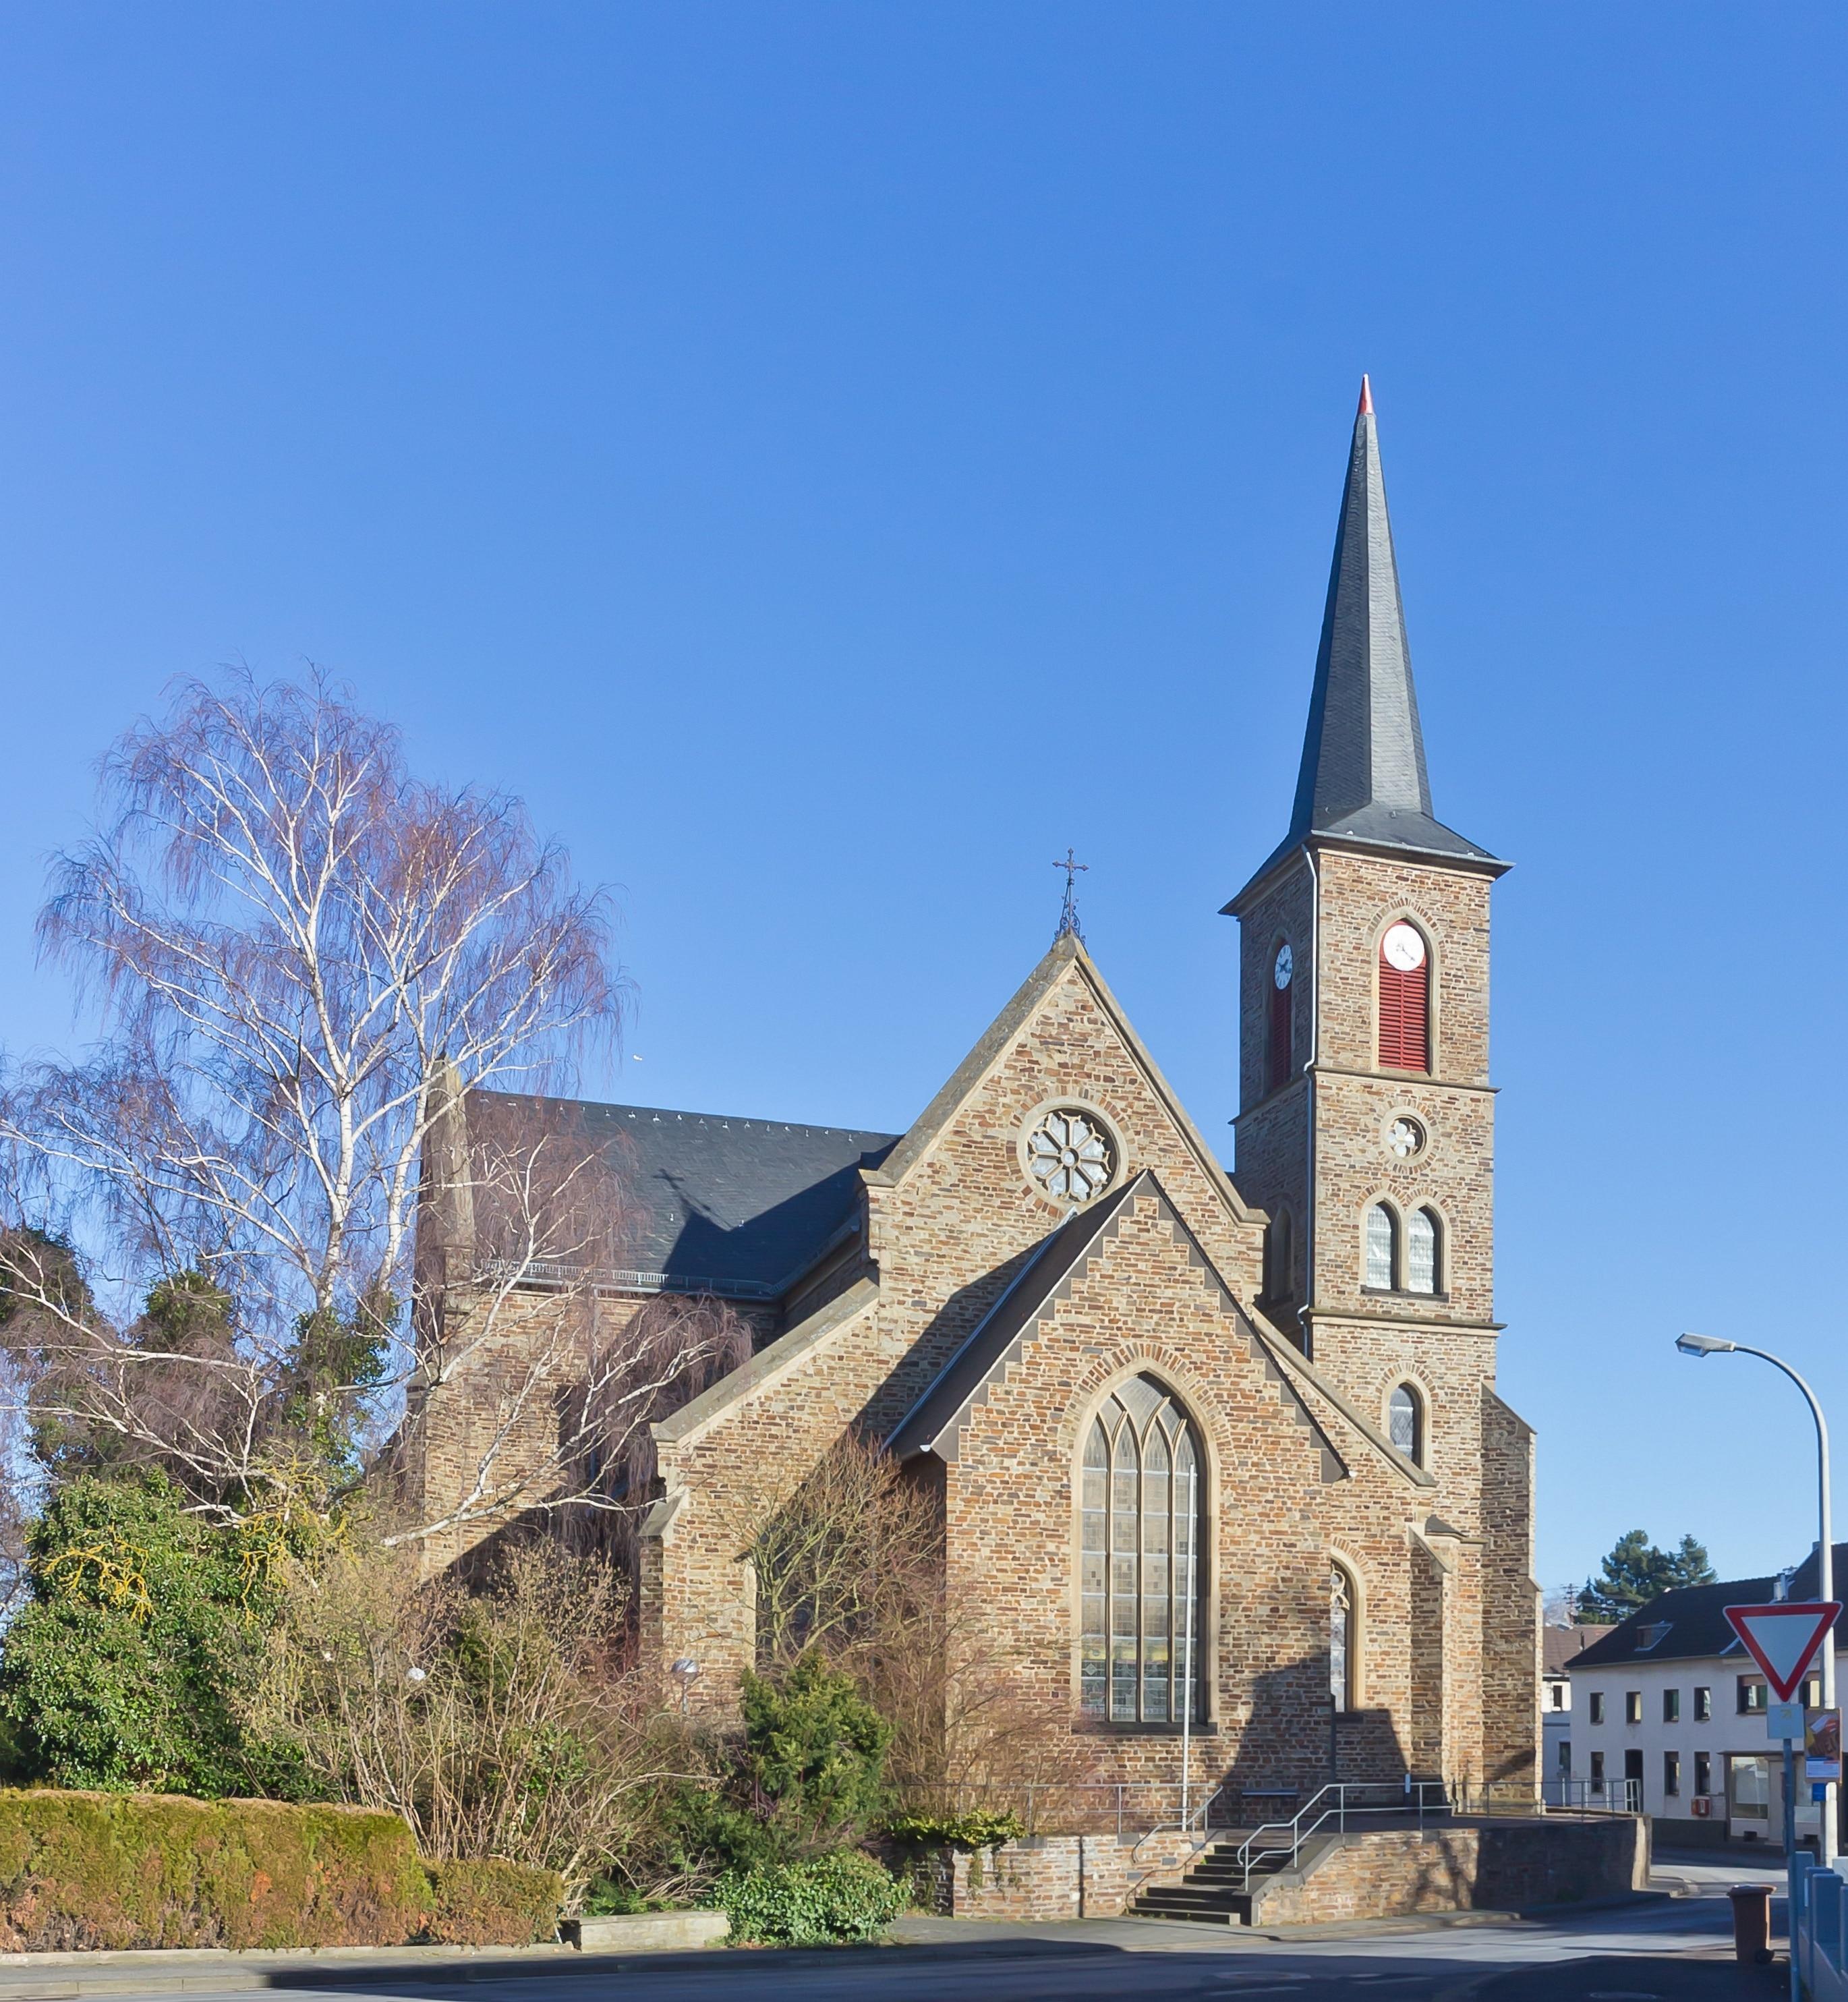 Meckenheim, North Rhine-Westphalia, Germany